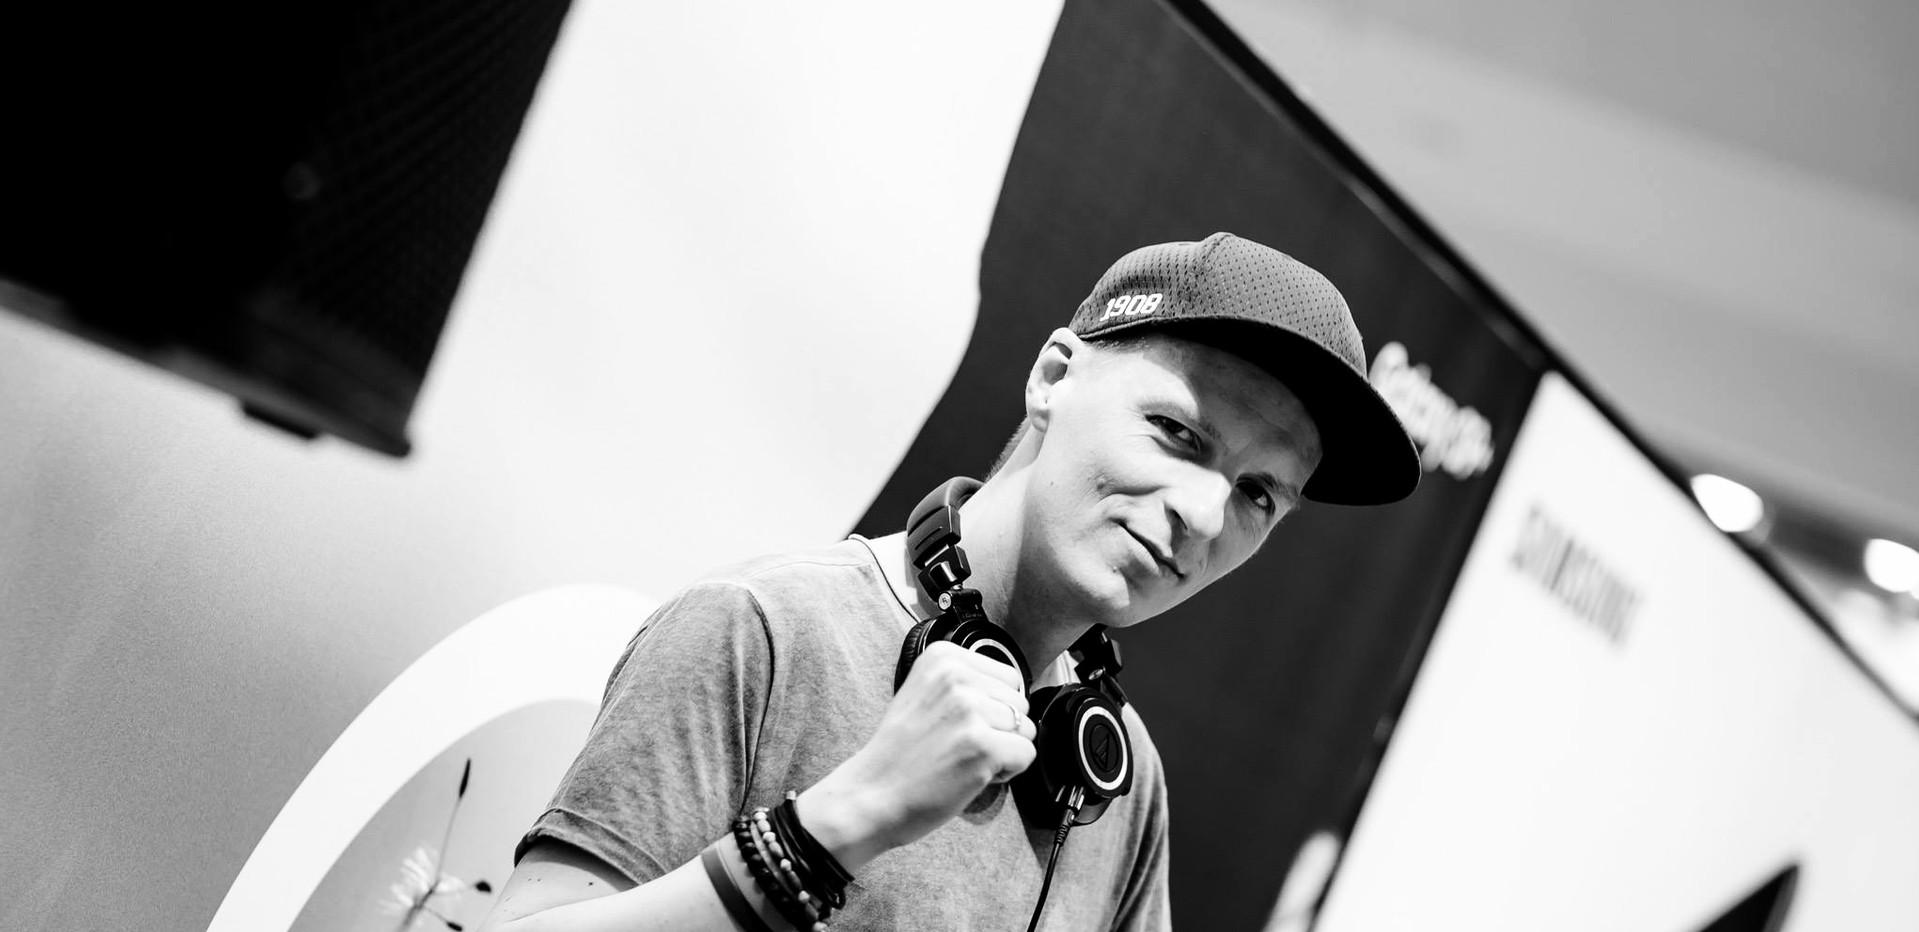 DJ JuoKaz paslaugos - PC Ozas - kolekcij